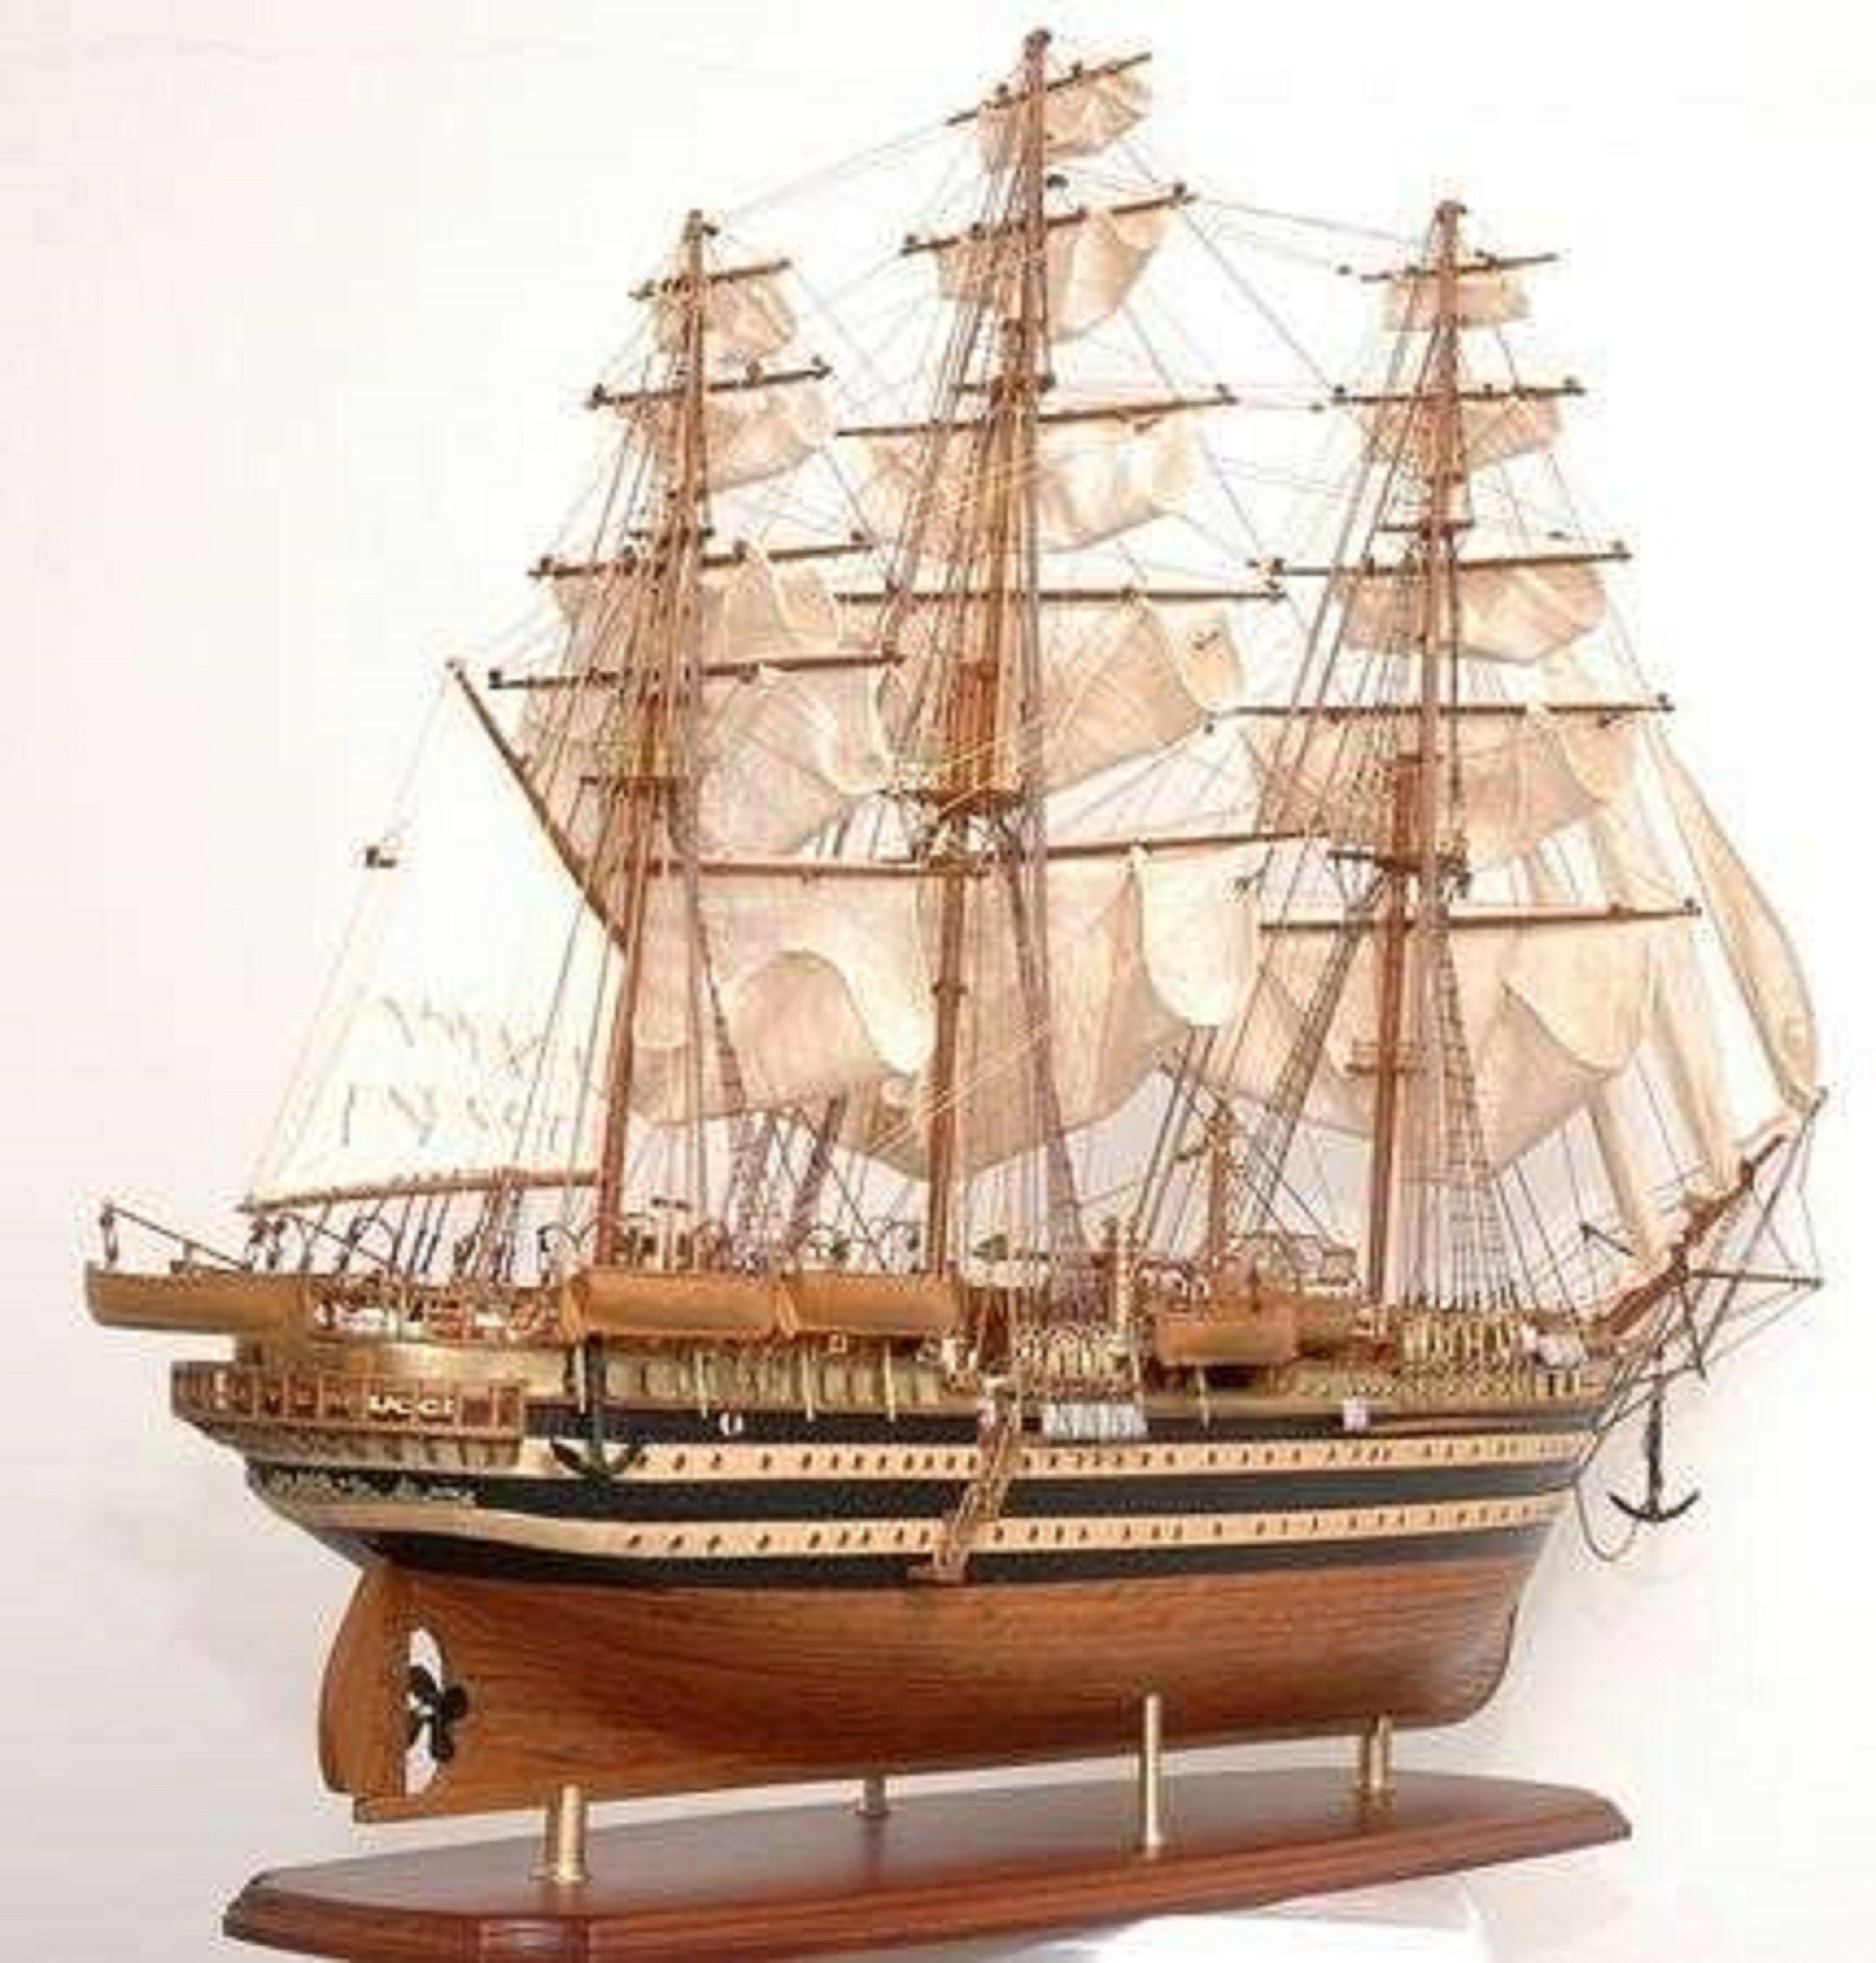 498-7778-Amerigo-Vespucci-Model-Ship-Superior-Range